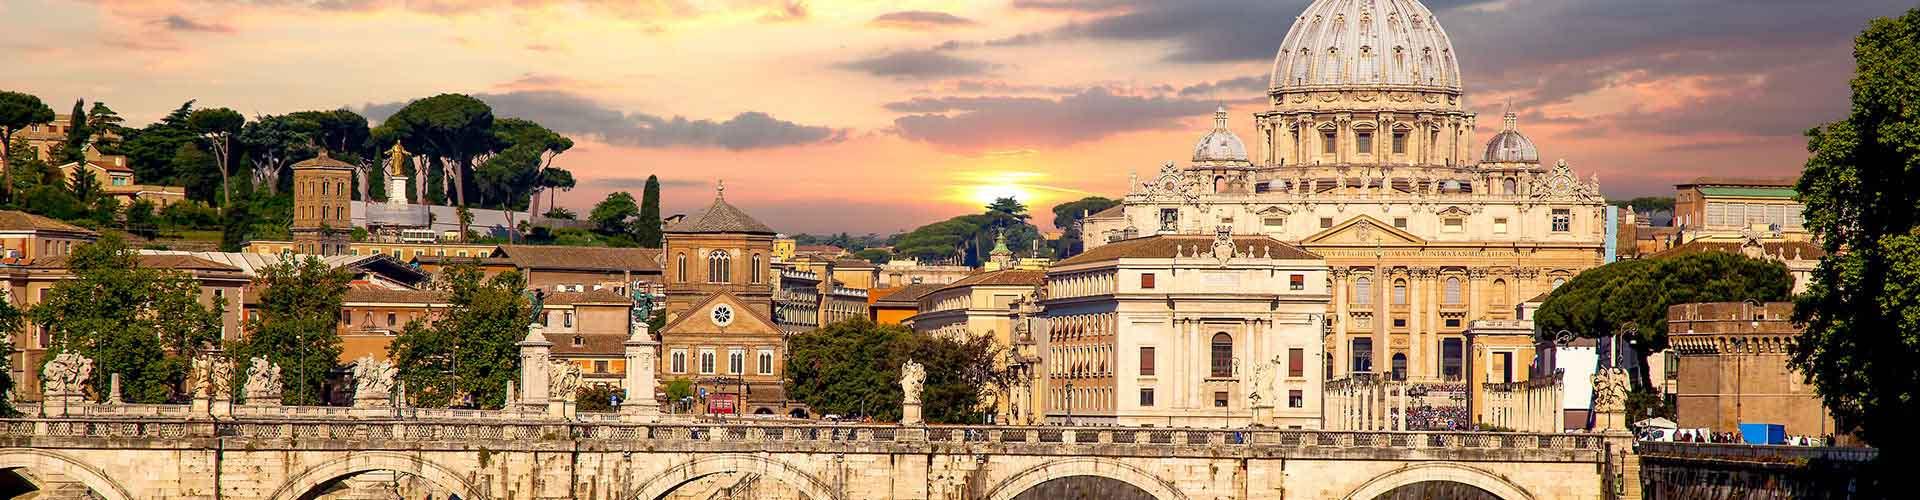 Roma - Hoteles baratos en Roma. Mapas de Roma, Fotos y comentarios de cada Hotel en Roma.